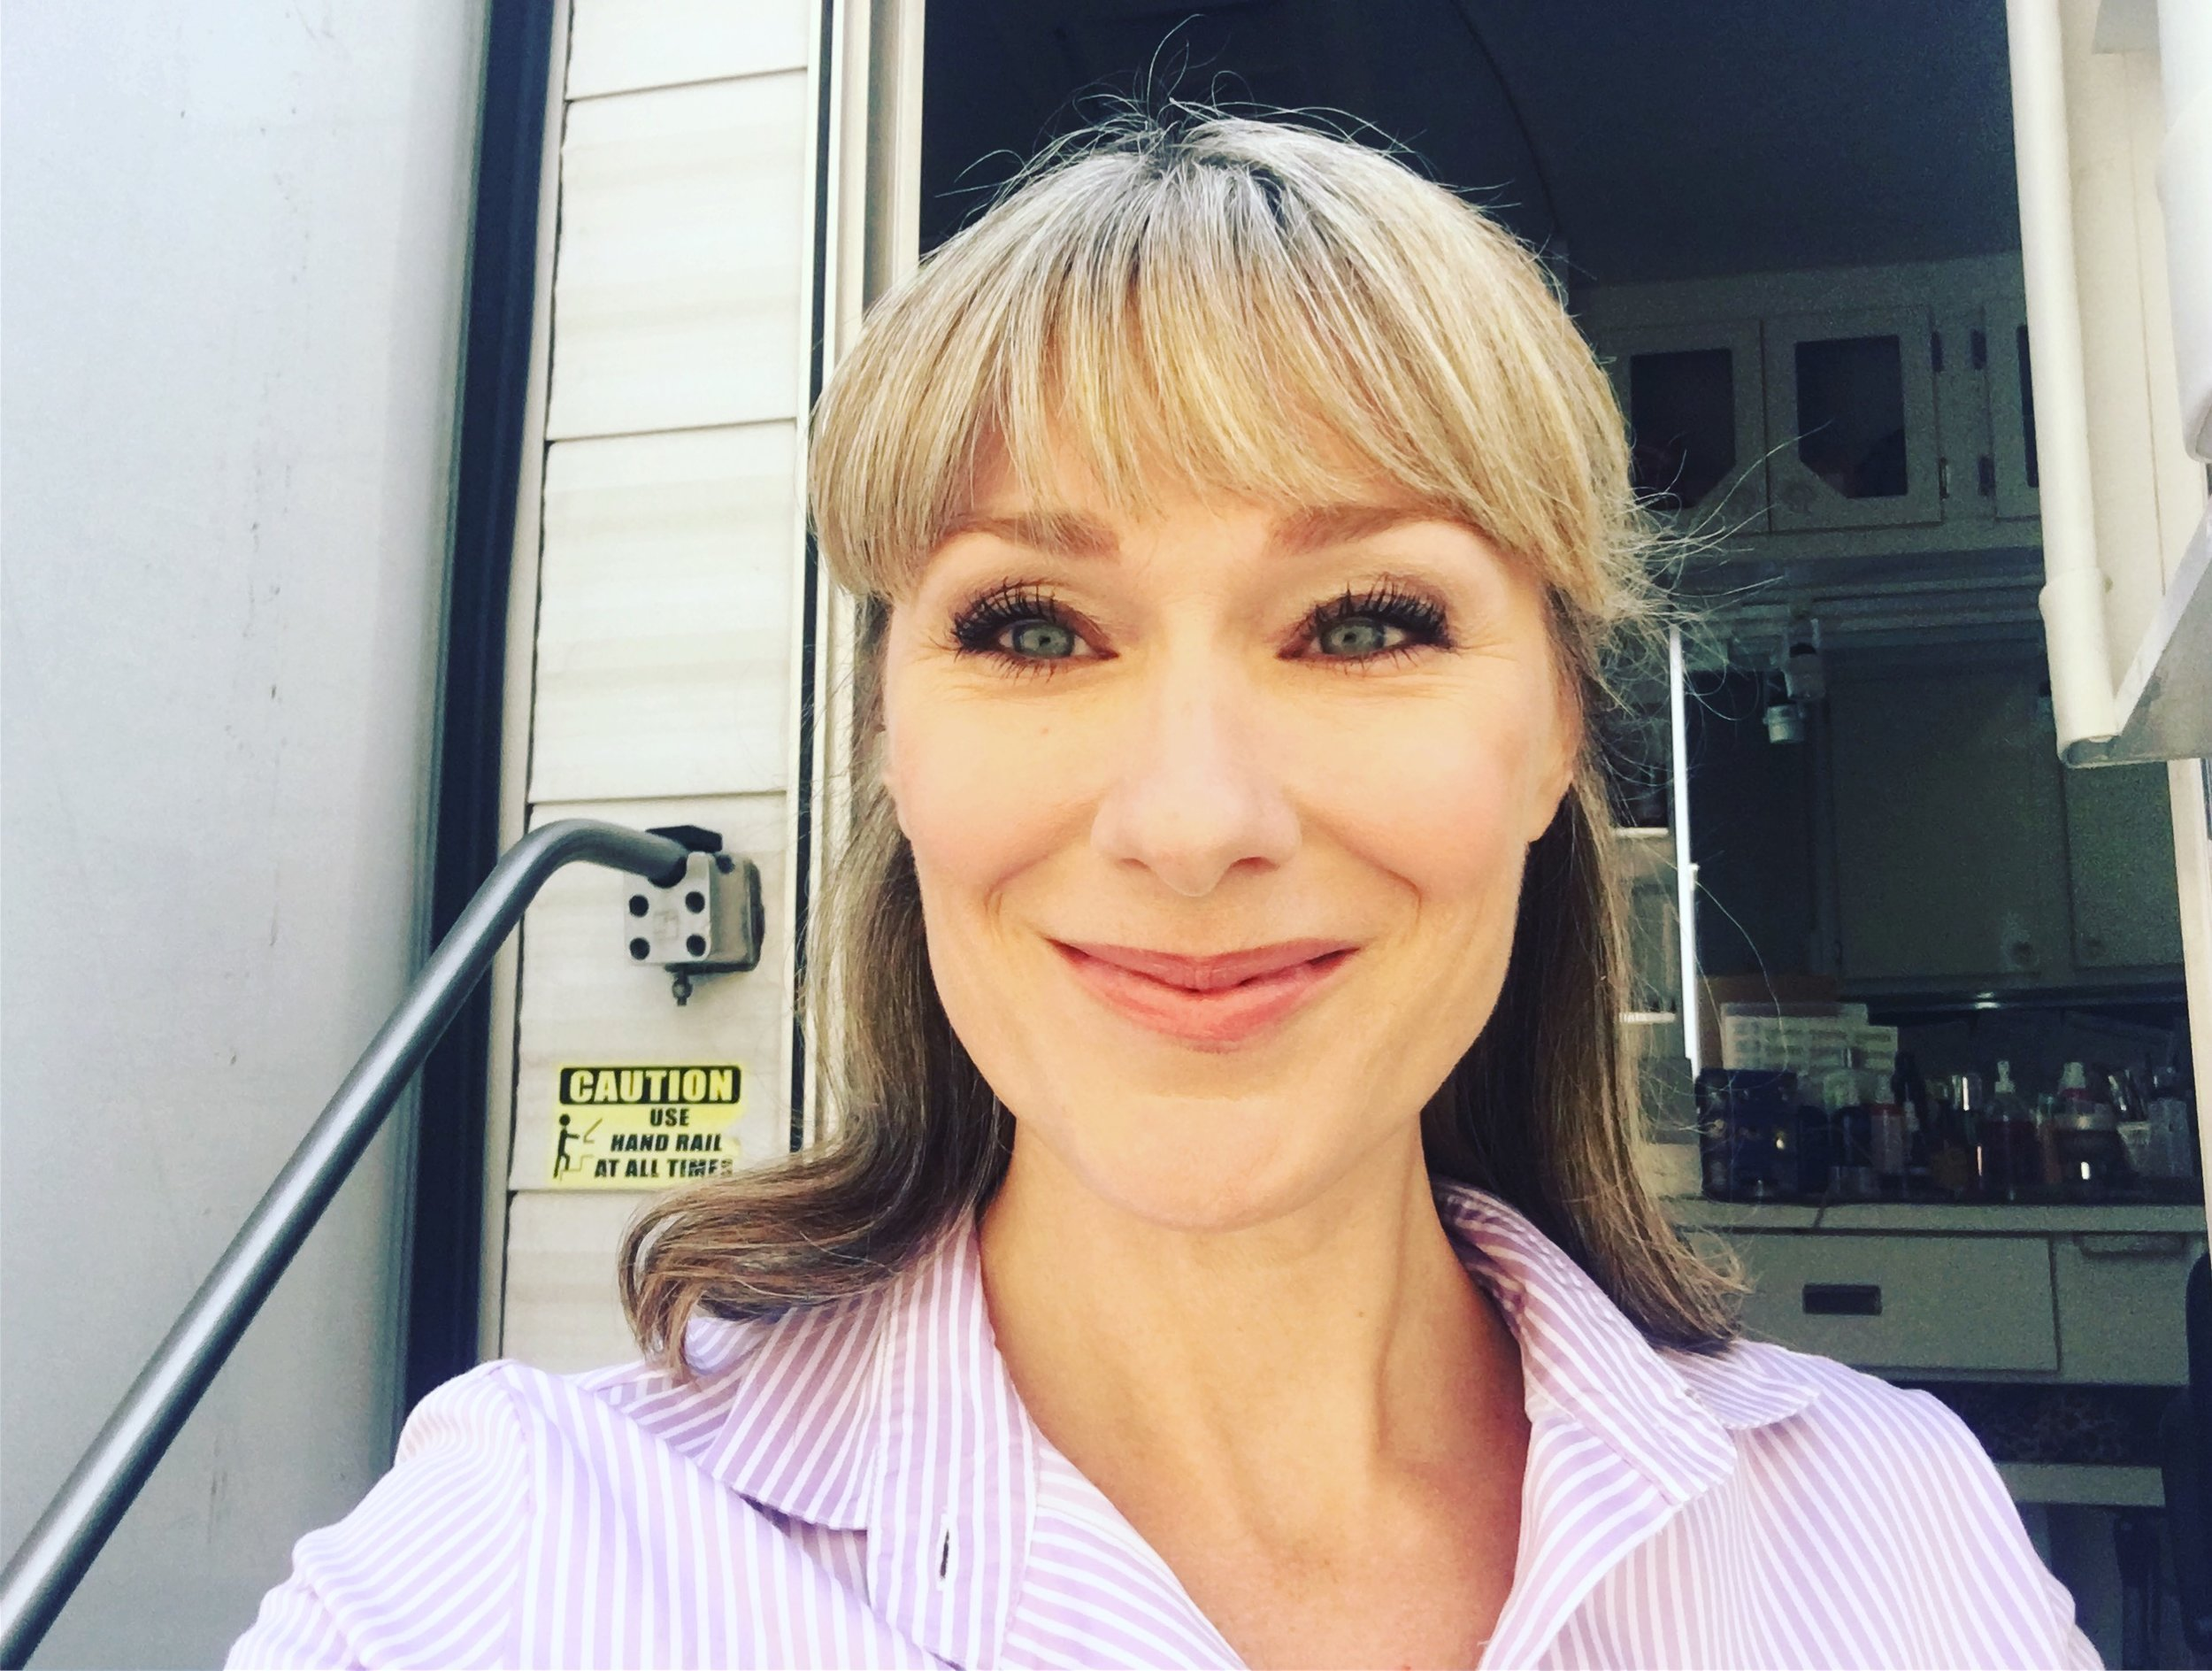 Dr. Anne Crowley on Shameless Season 8 episode #3!